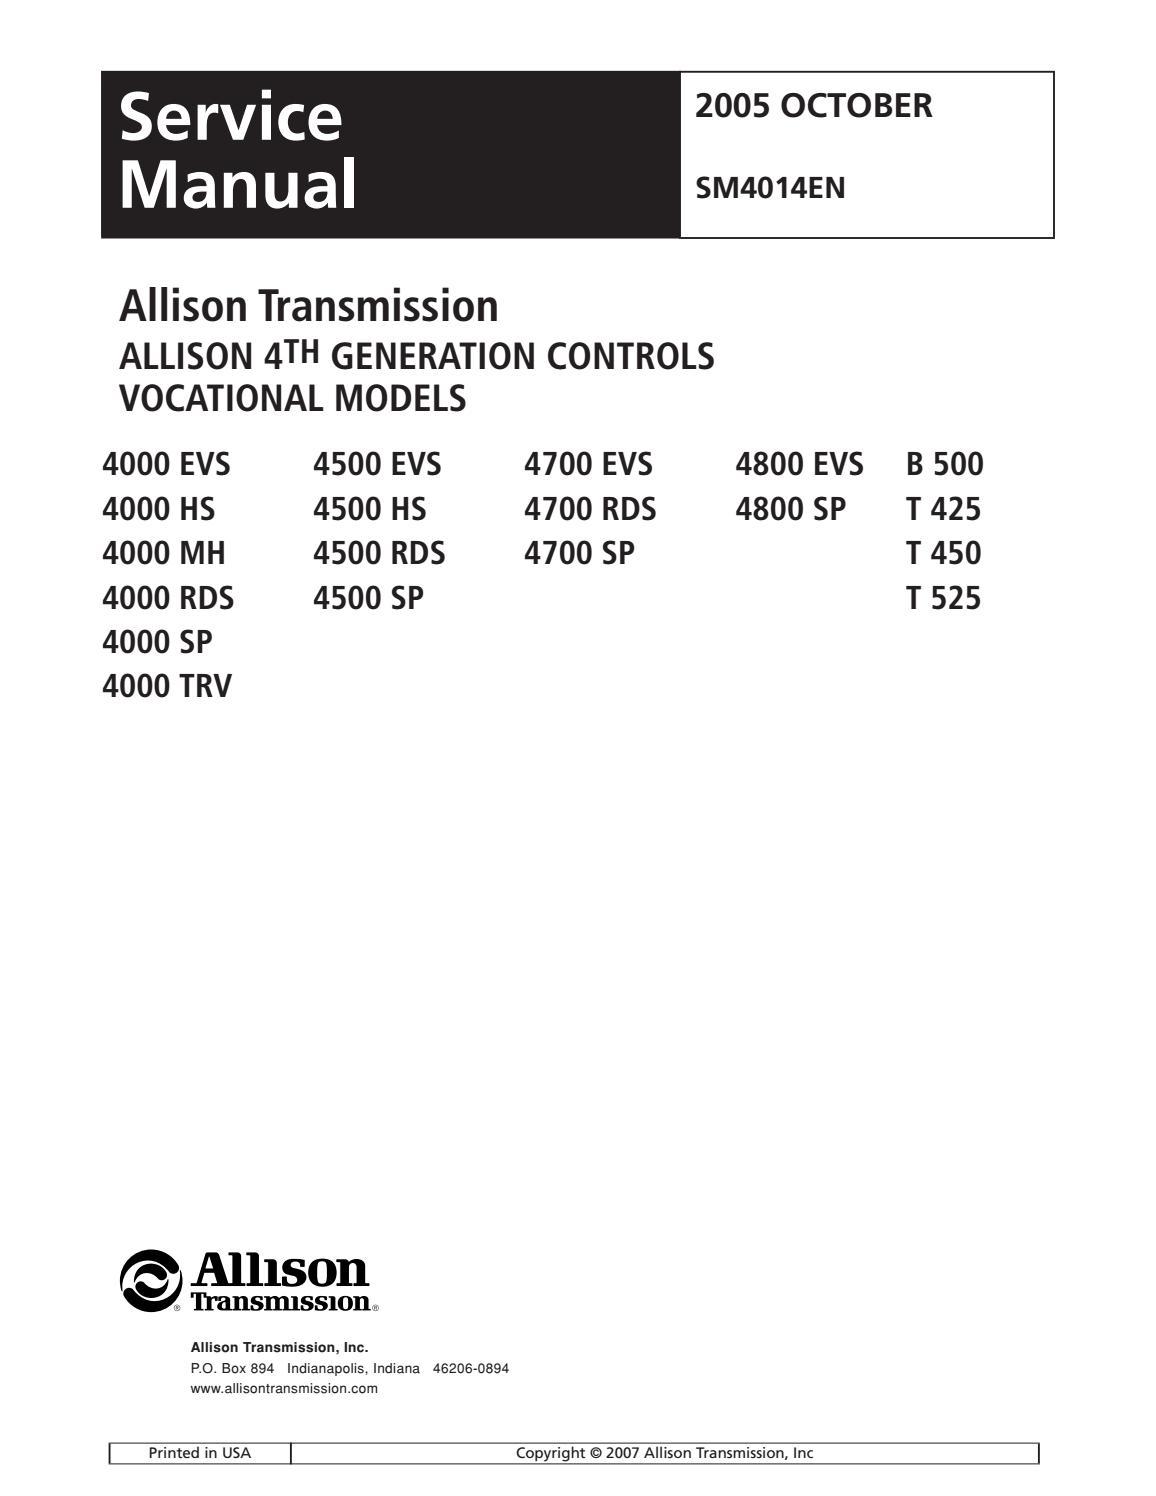 Allison Transmission Manual Pdf